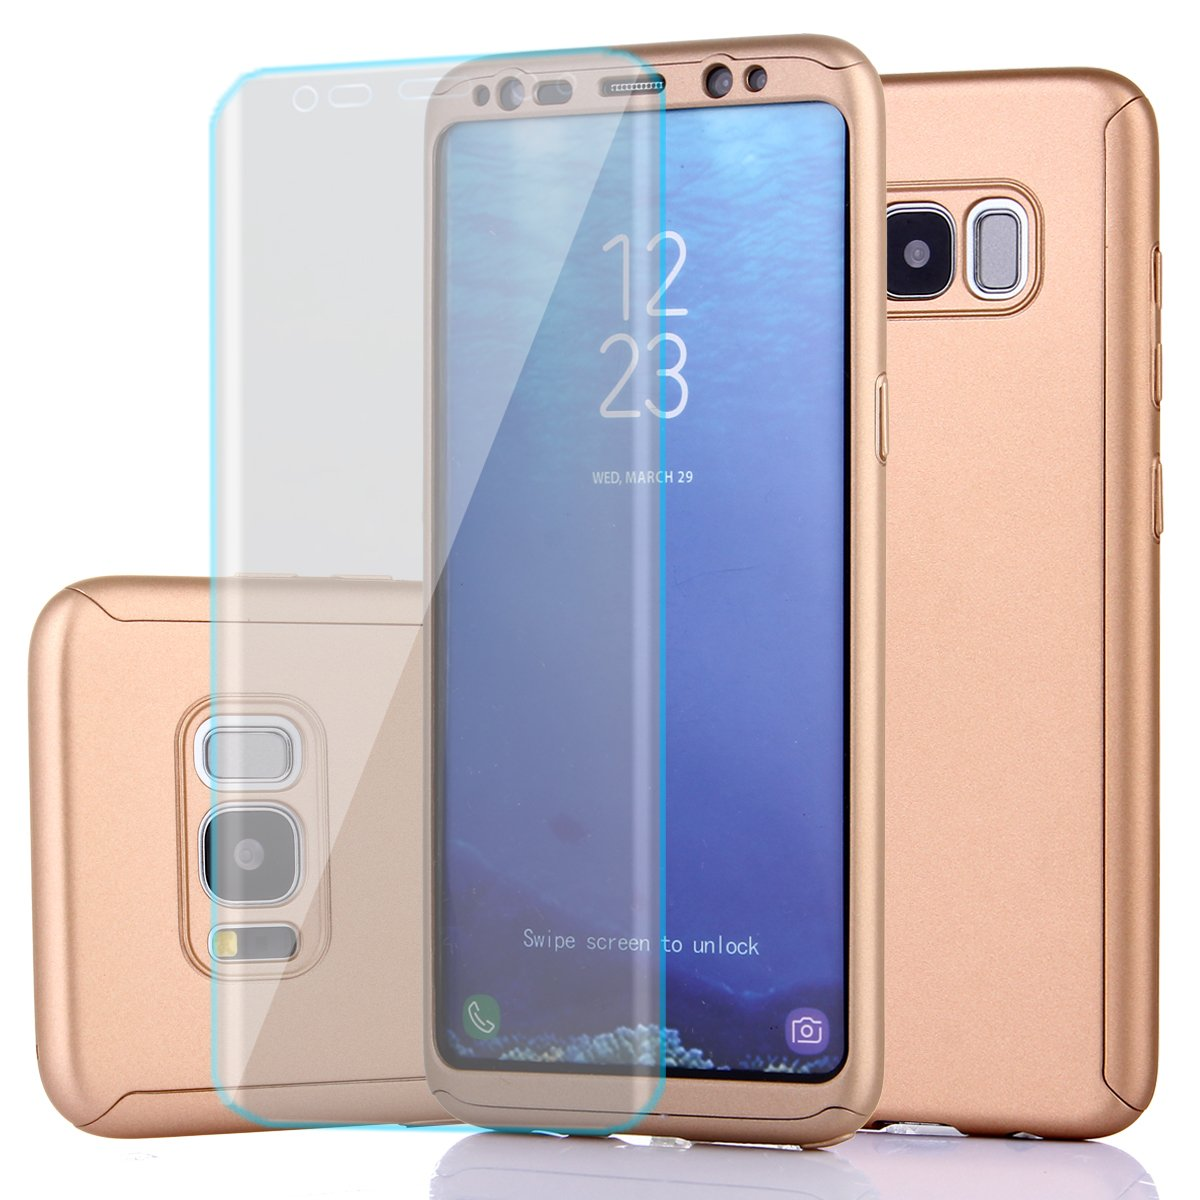 Samsung Galaxy s8ケース、フルボディ保護超薄型ハードPCケースwith aソフトHDスクリーンプロテクター360すべてラウンドAnti Scratchリムーバブルハイブリッドカバーfor Galaxy s8 6-12 months B073JW87YL 1gold